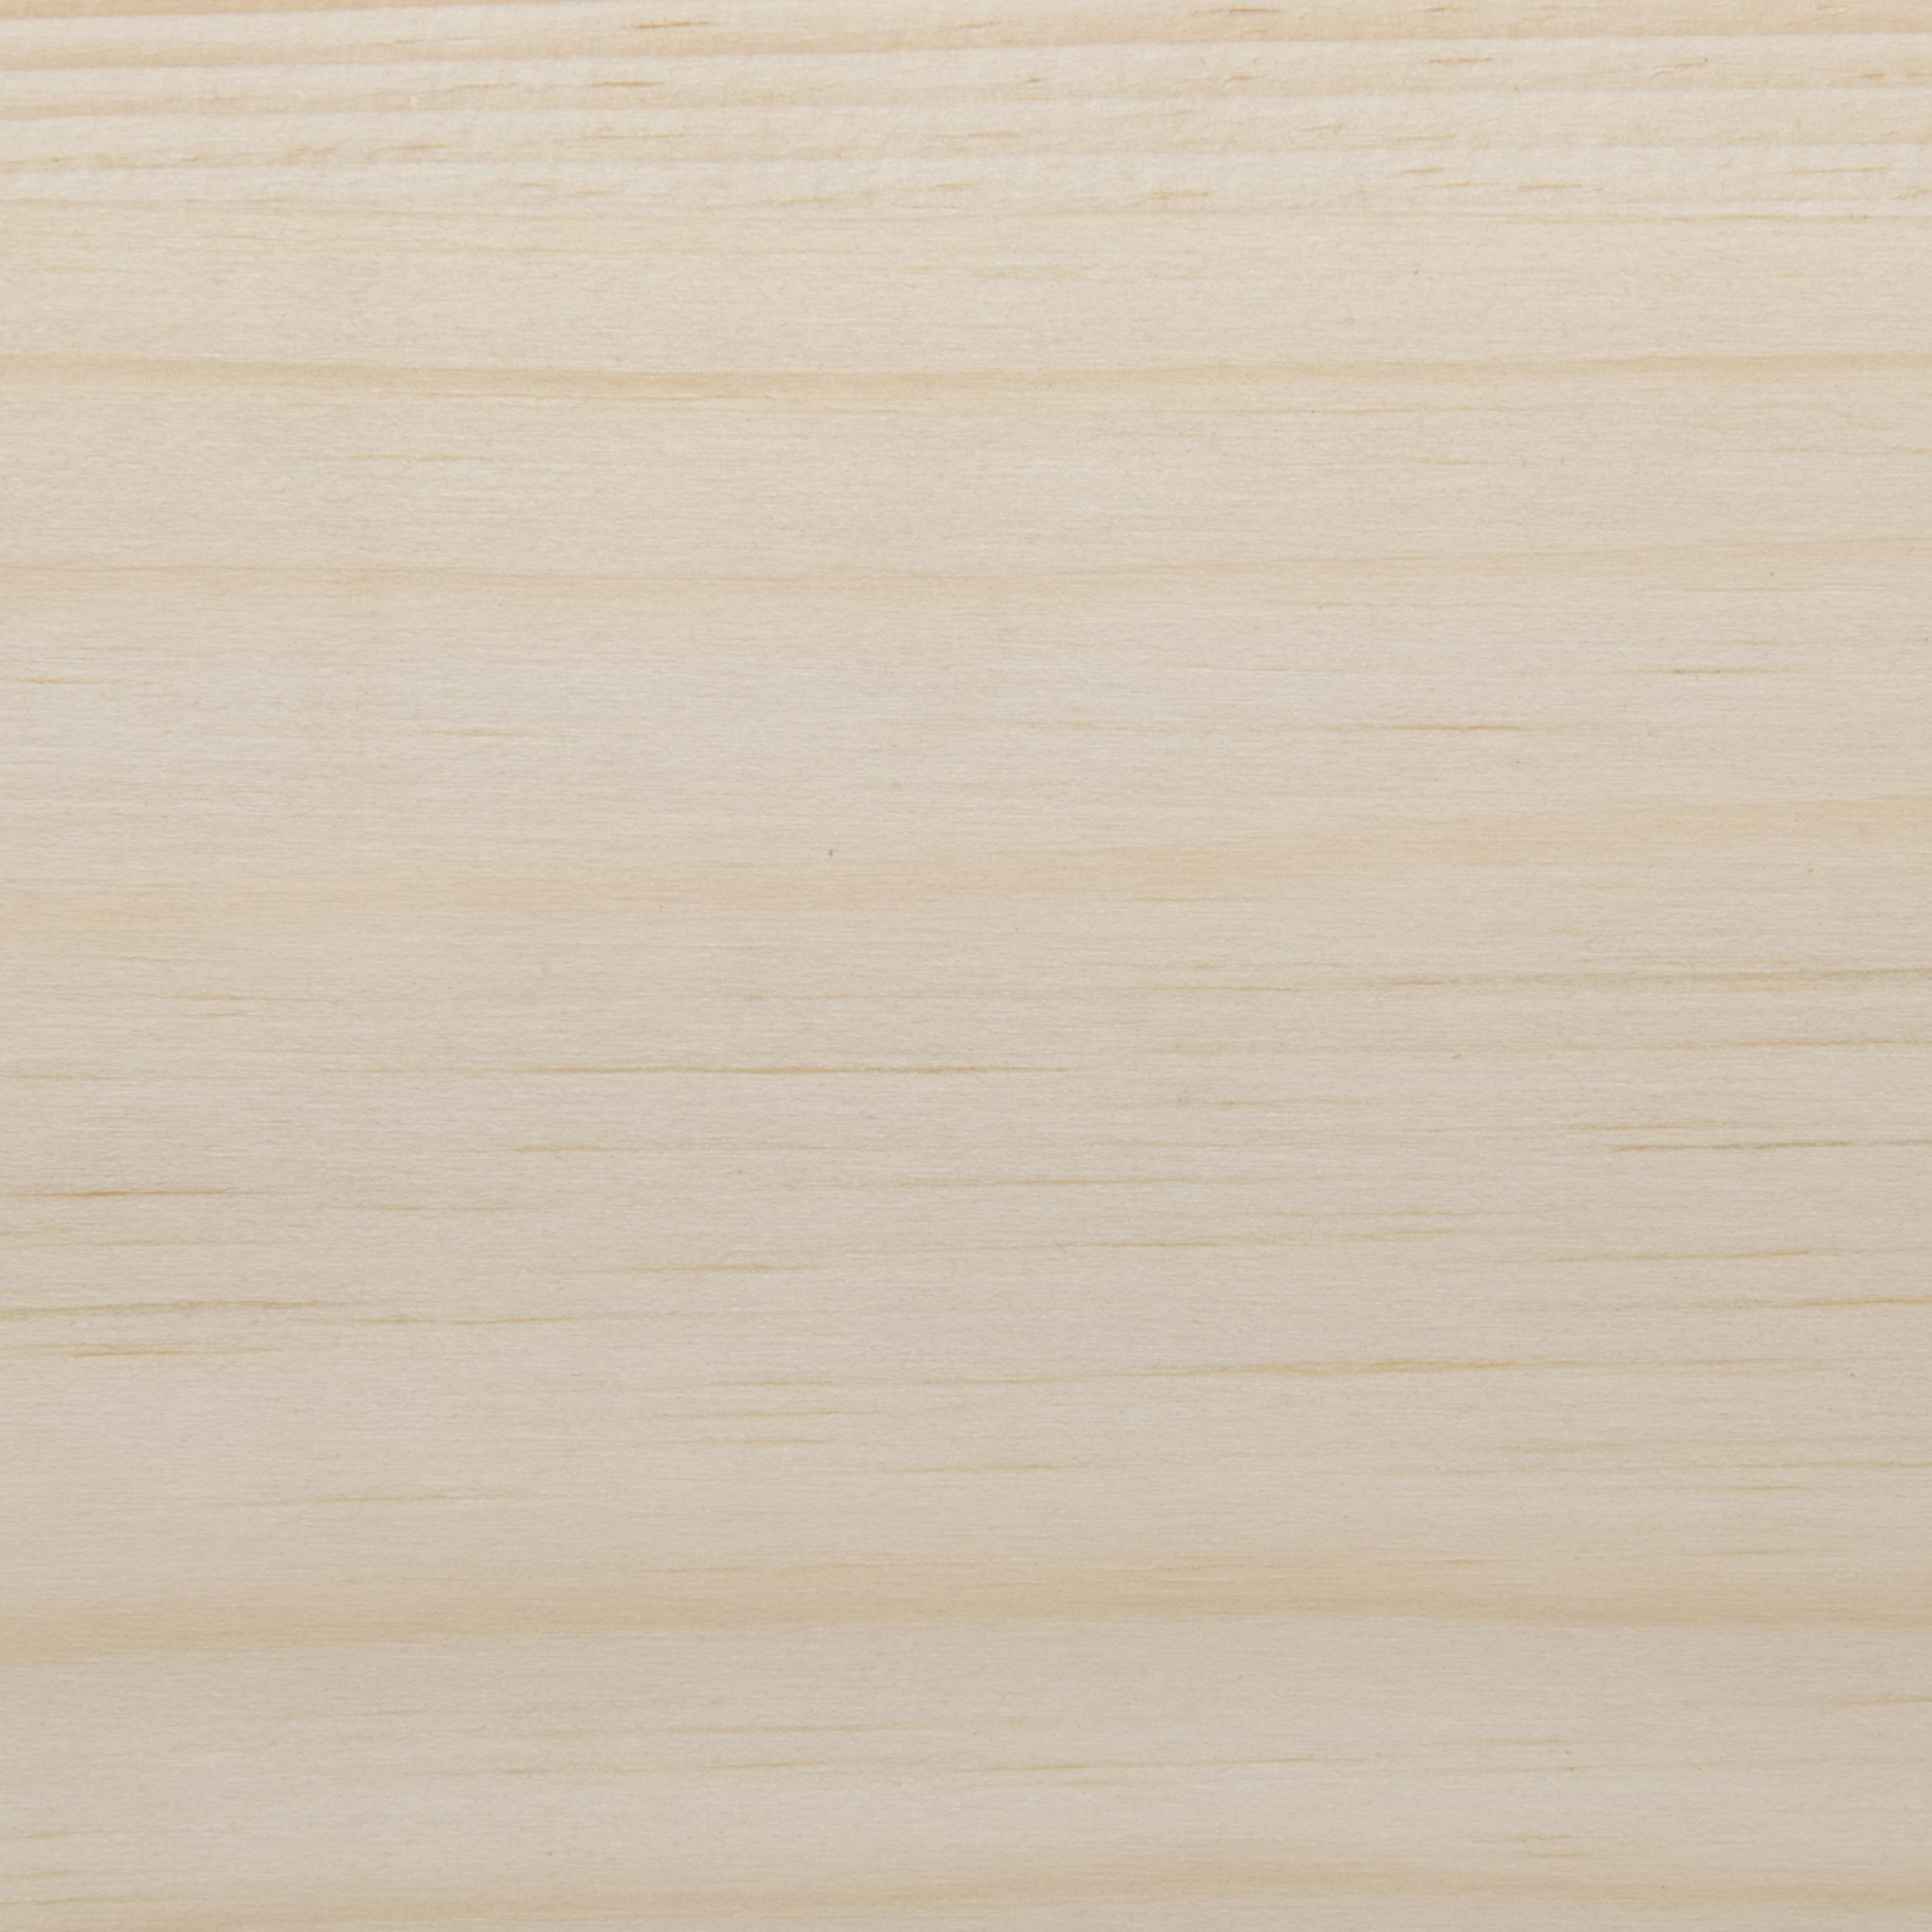 White Pine Veneer Sheet Plain Sliced 4' x 8' 2-Ply Wood on Wood